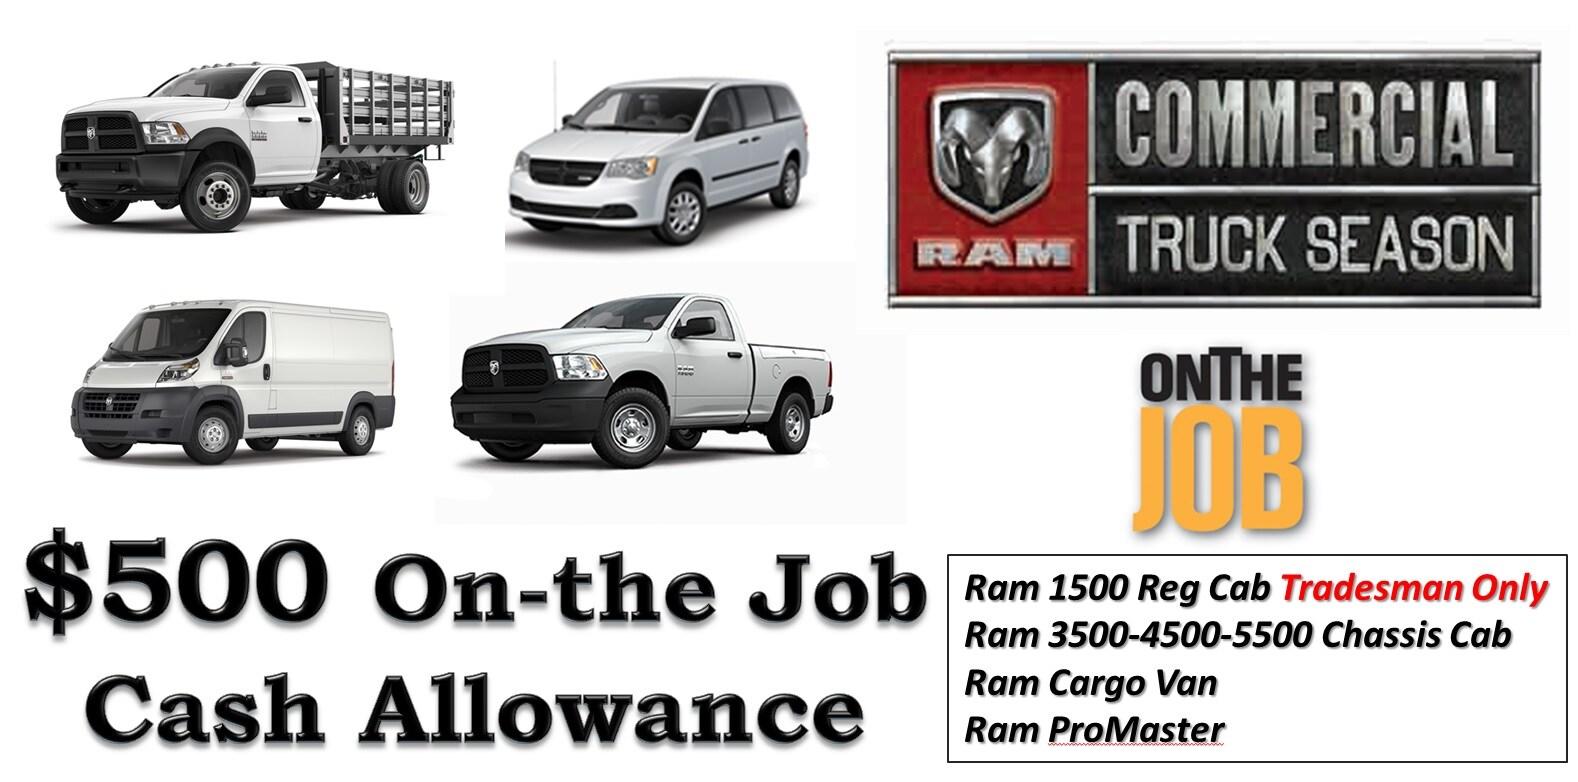 Tate Branch Auto Group New Chrysler Dodge Jeep Ram